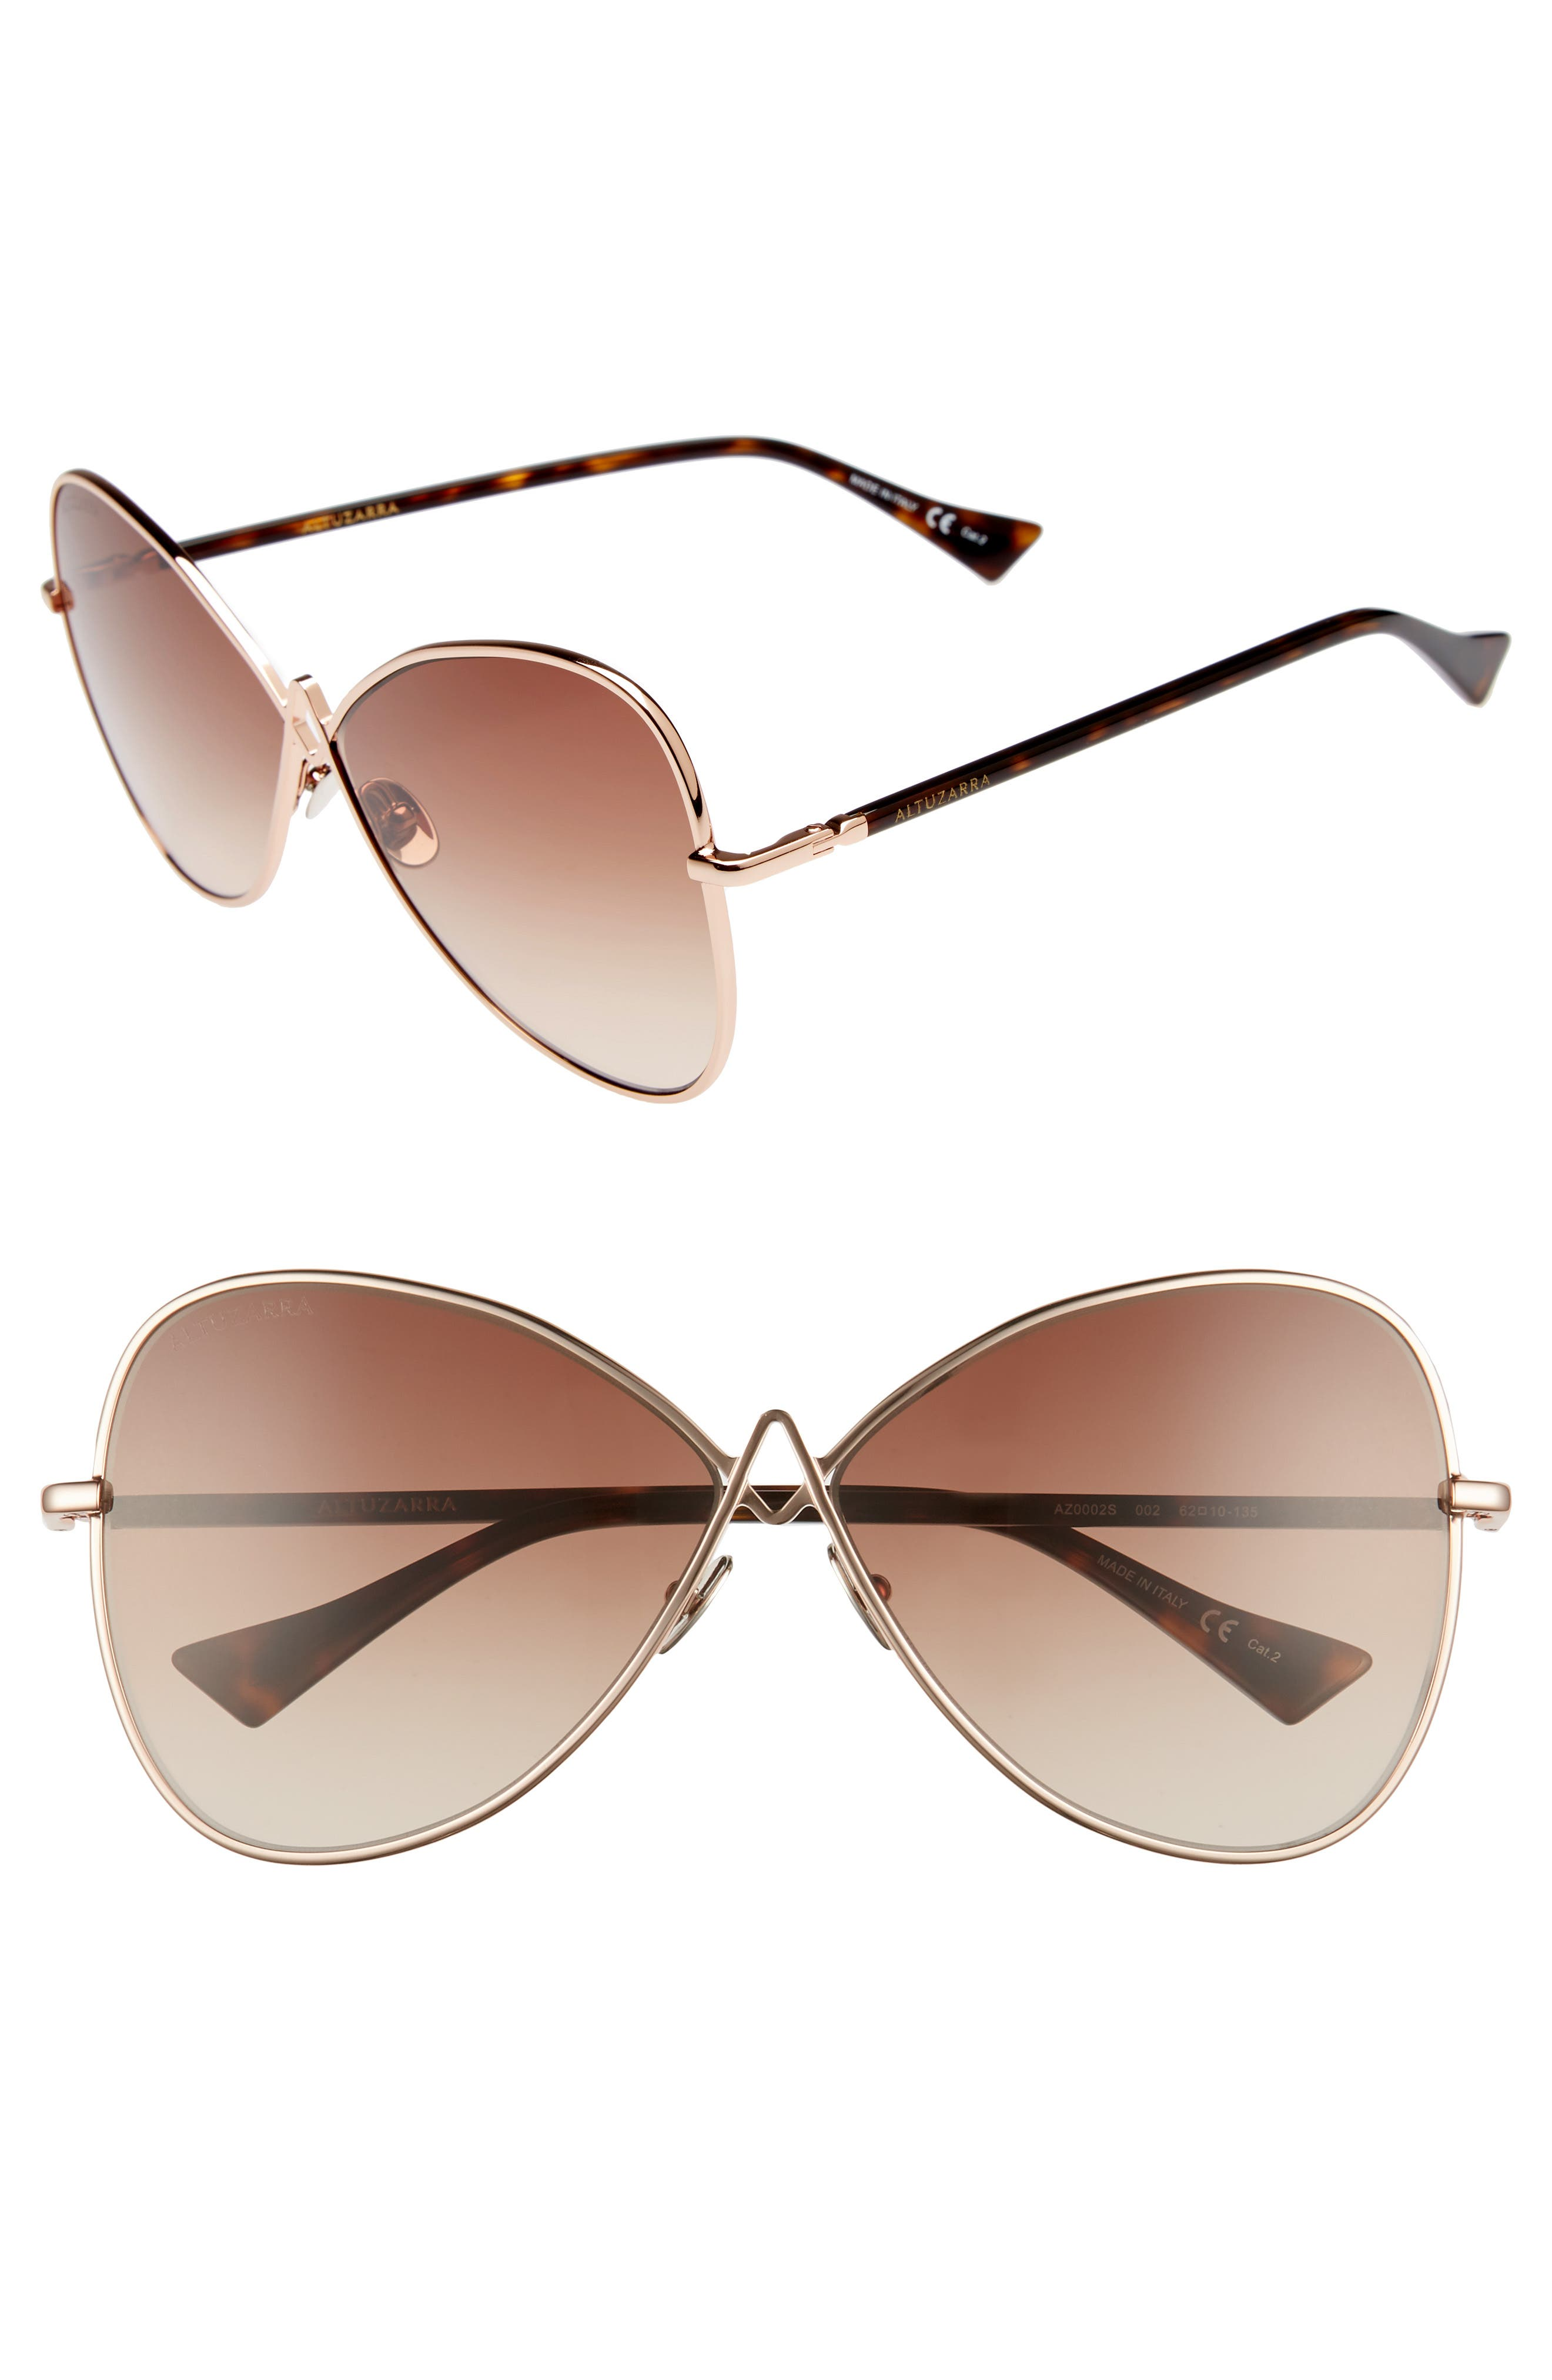 62mm Sunglasses,                         Main,                         color, Rose Gold